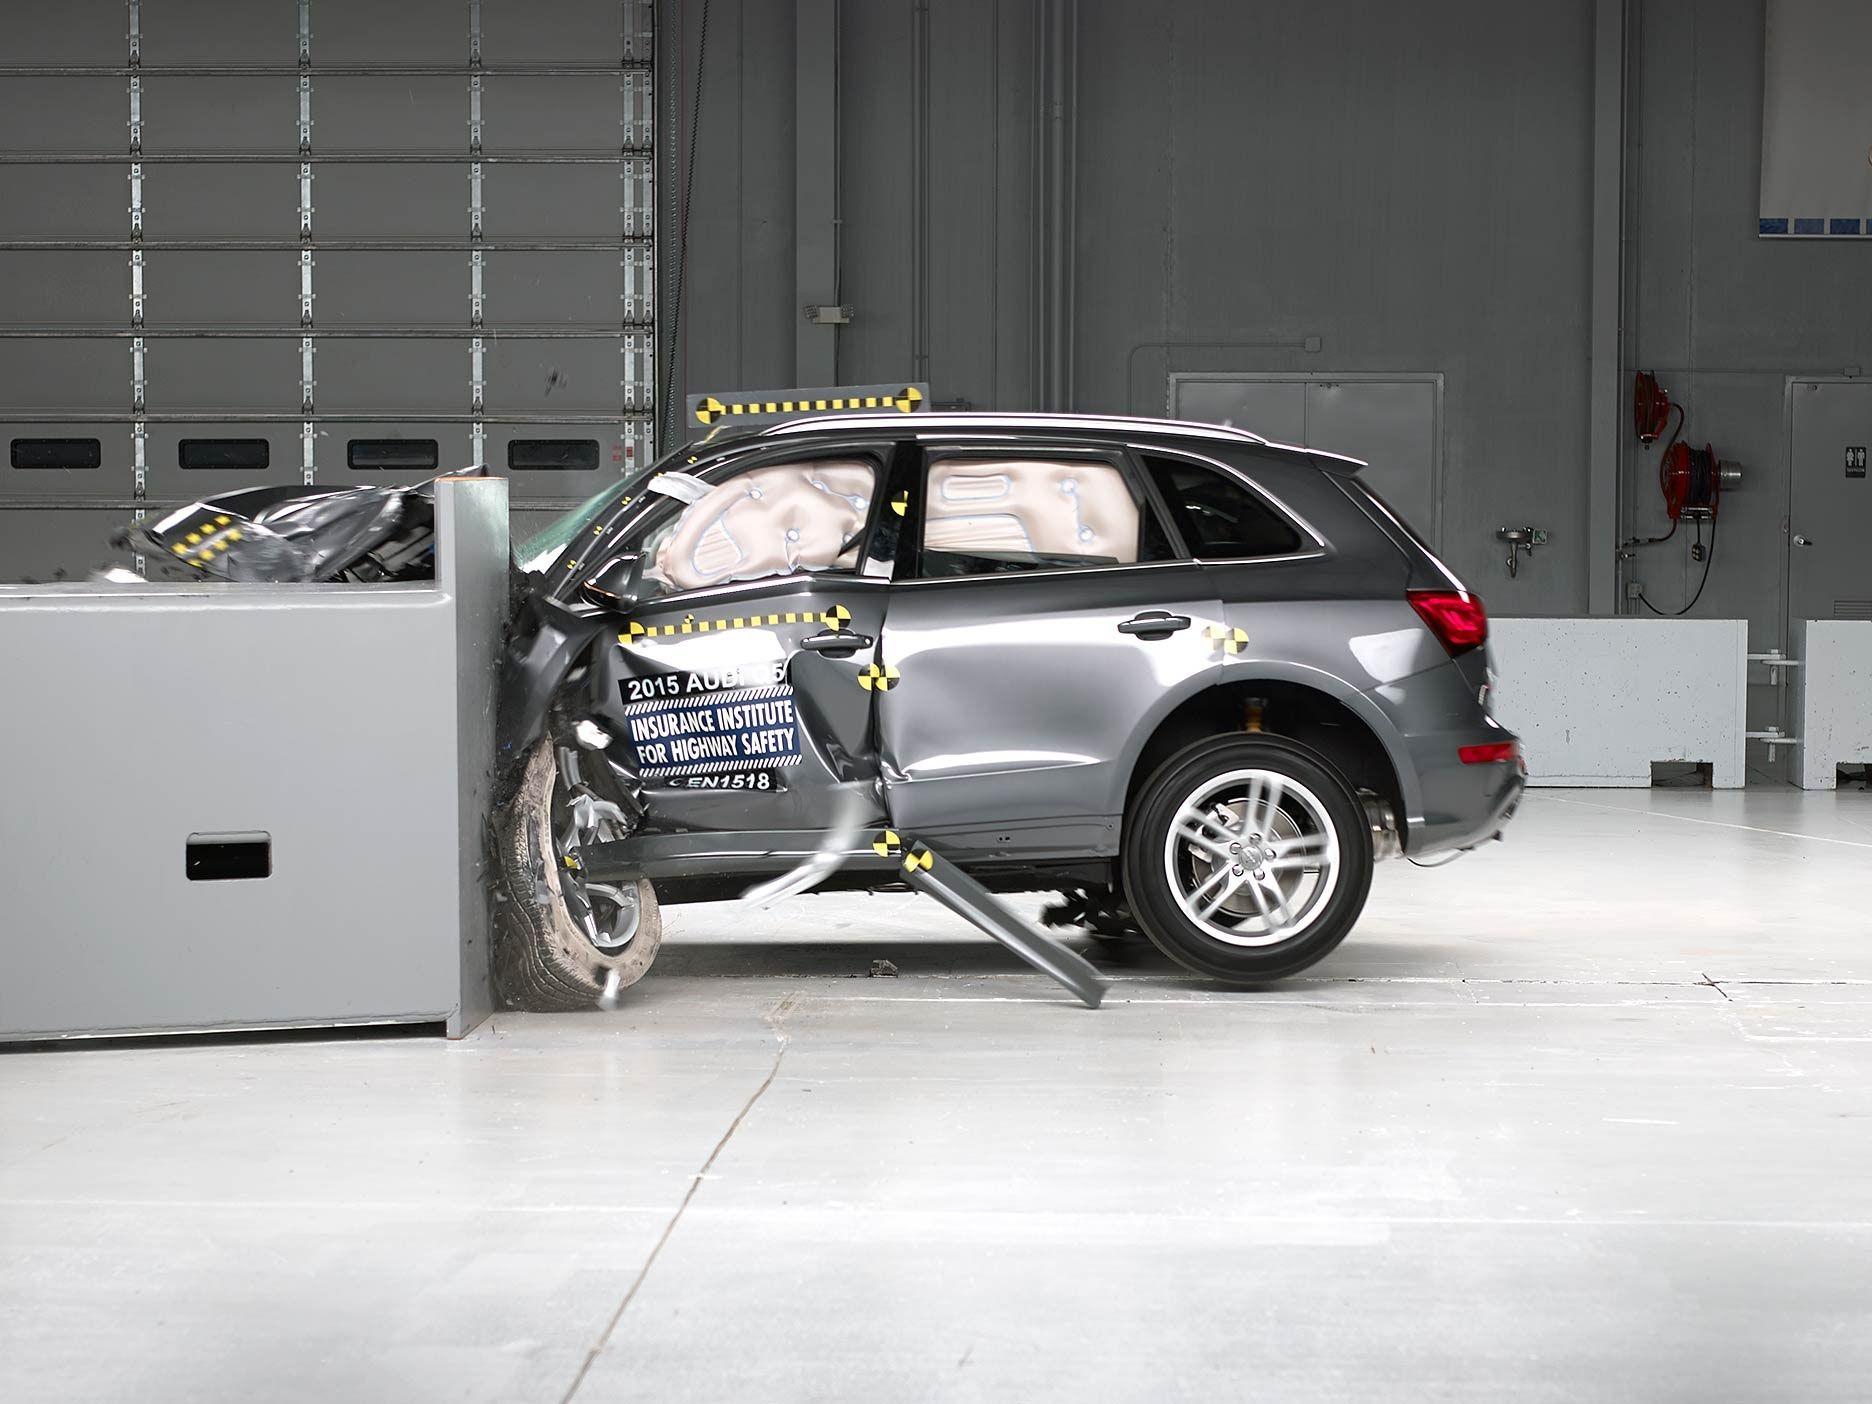 2015 Audi Q5 Small Overlap Iihs Crash Test Audi Q5 Audi New